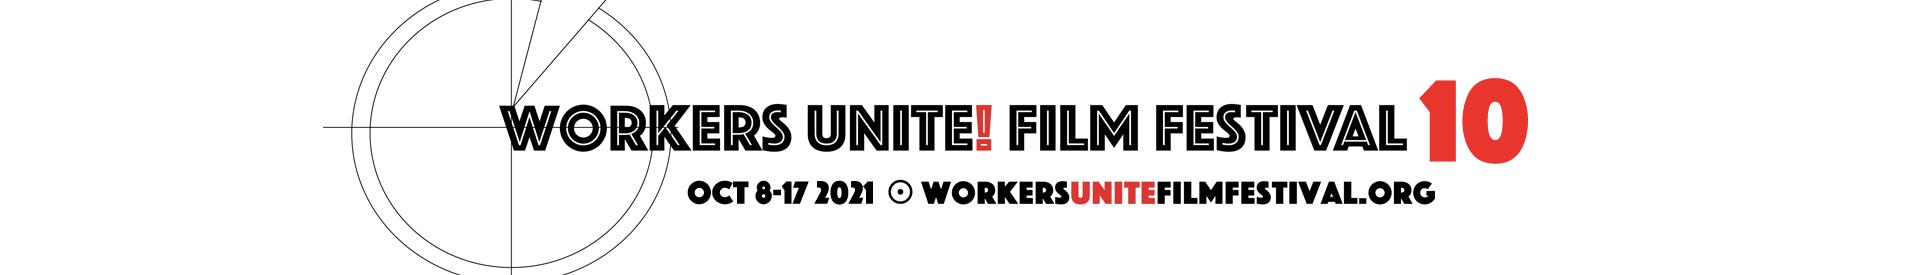 Workers Unite Film Festival 2021